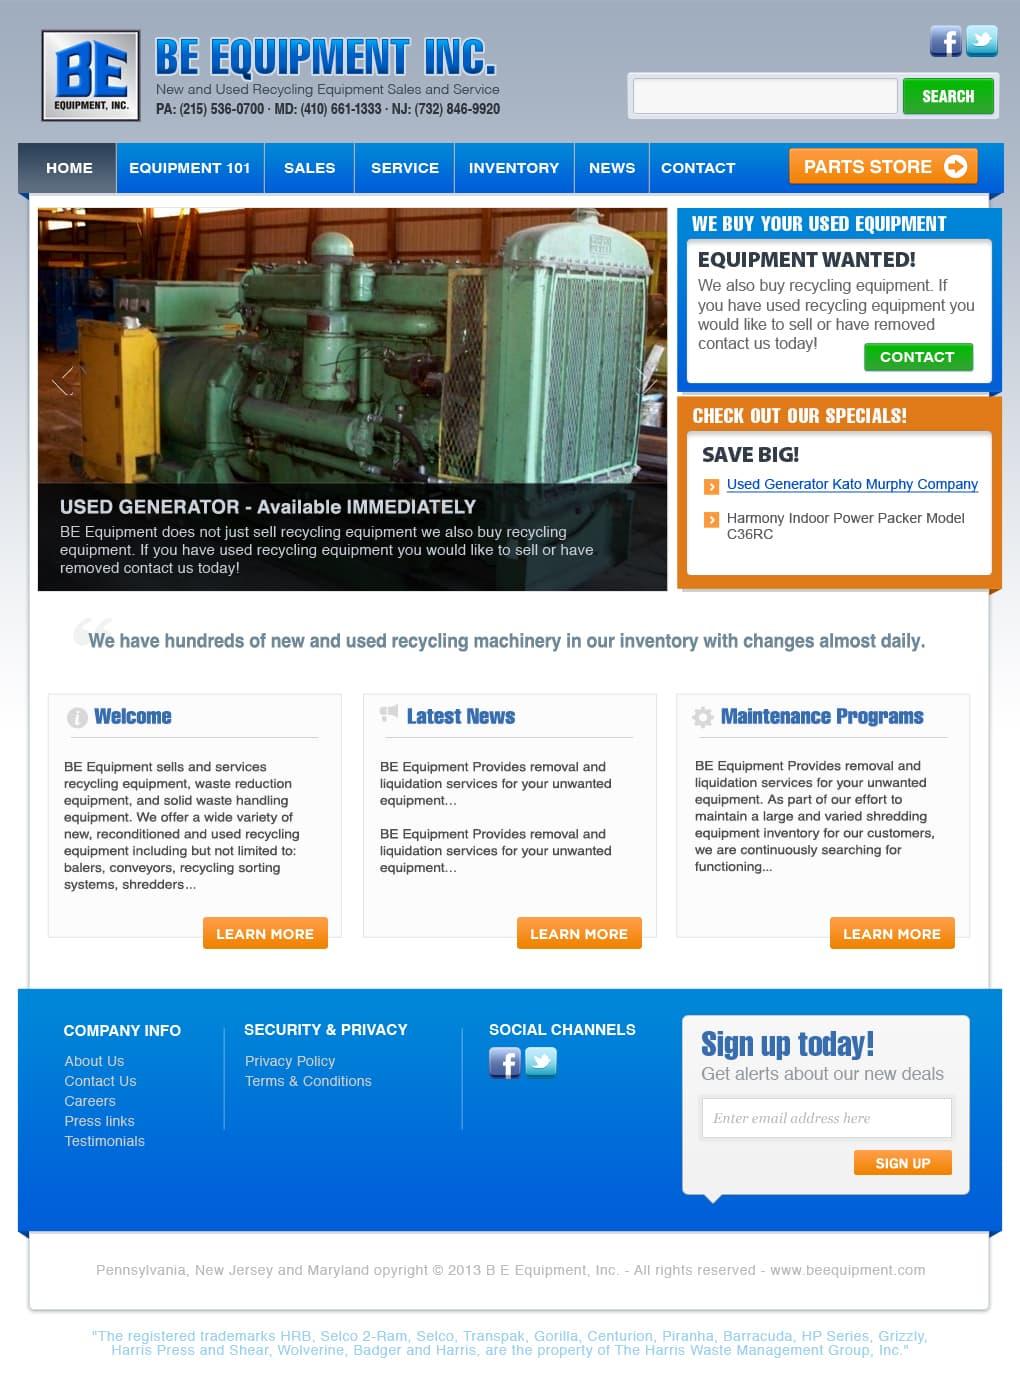 BE Equipment Webdesign